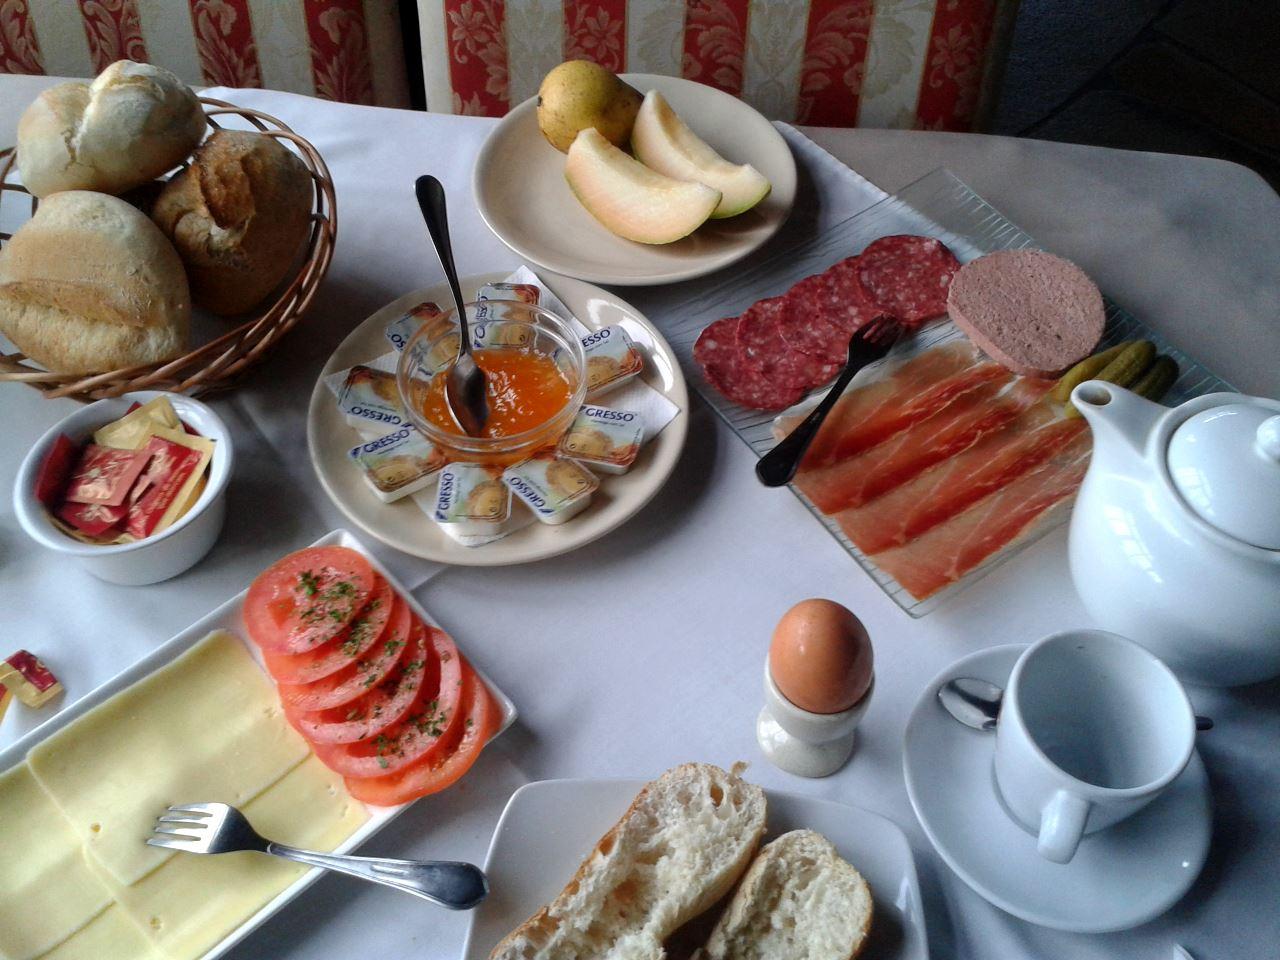 20131219_091037 cafe klenk rustico frühstück